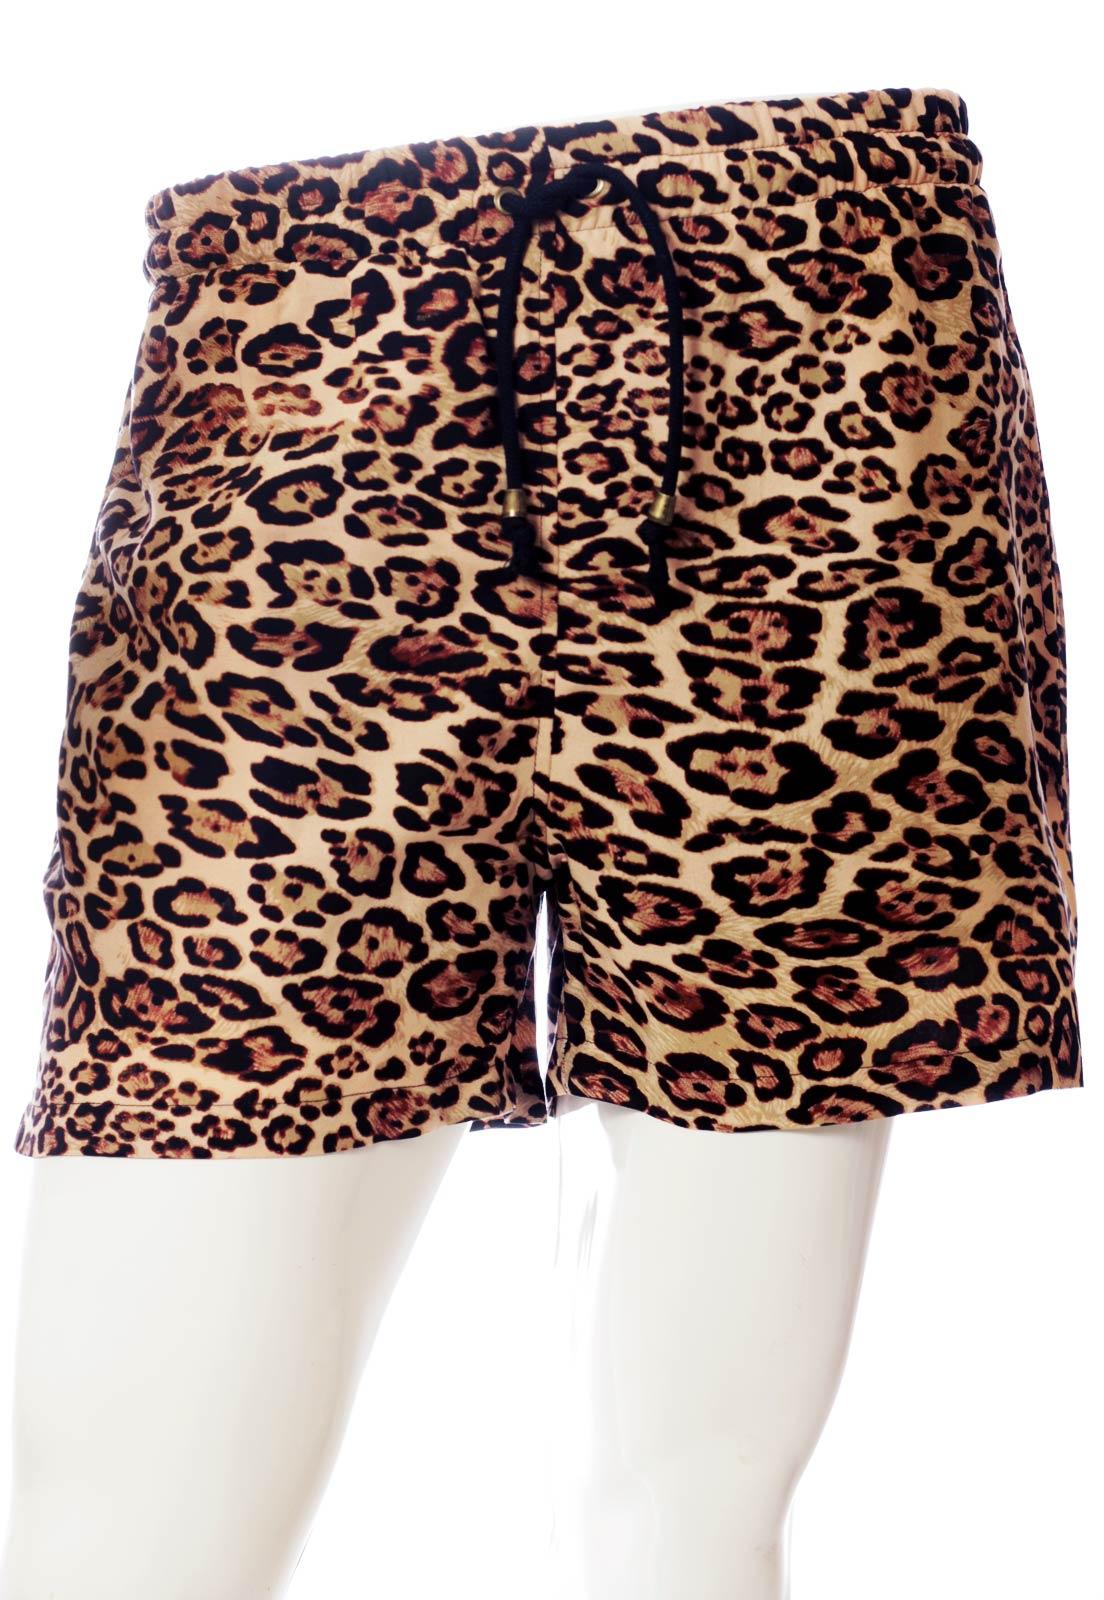 Conjunto Kimono + Shorts Oncinha Estampado ElephunK Animal Print Feminino Masculino Moda Marrom